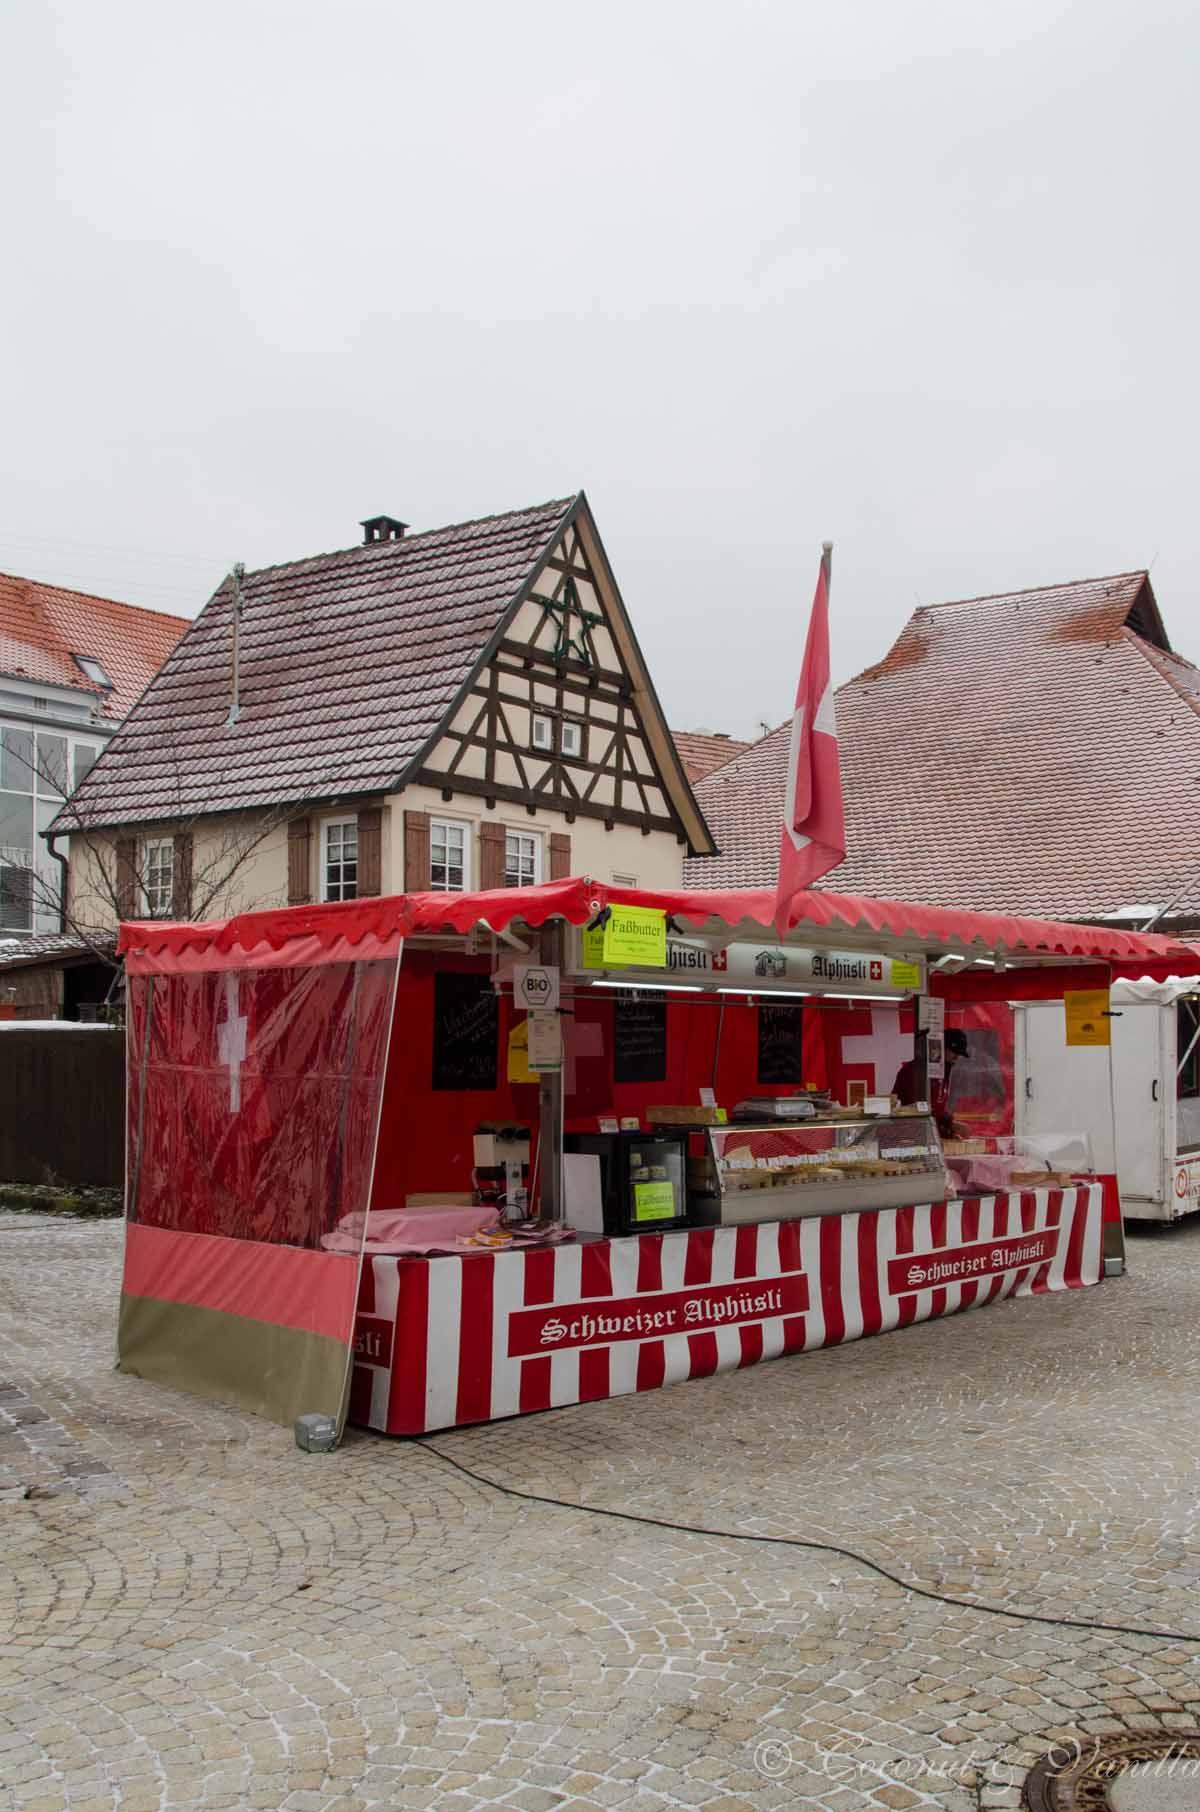 Metzingen Marktplatz, Schweizer Alphüsli